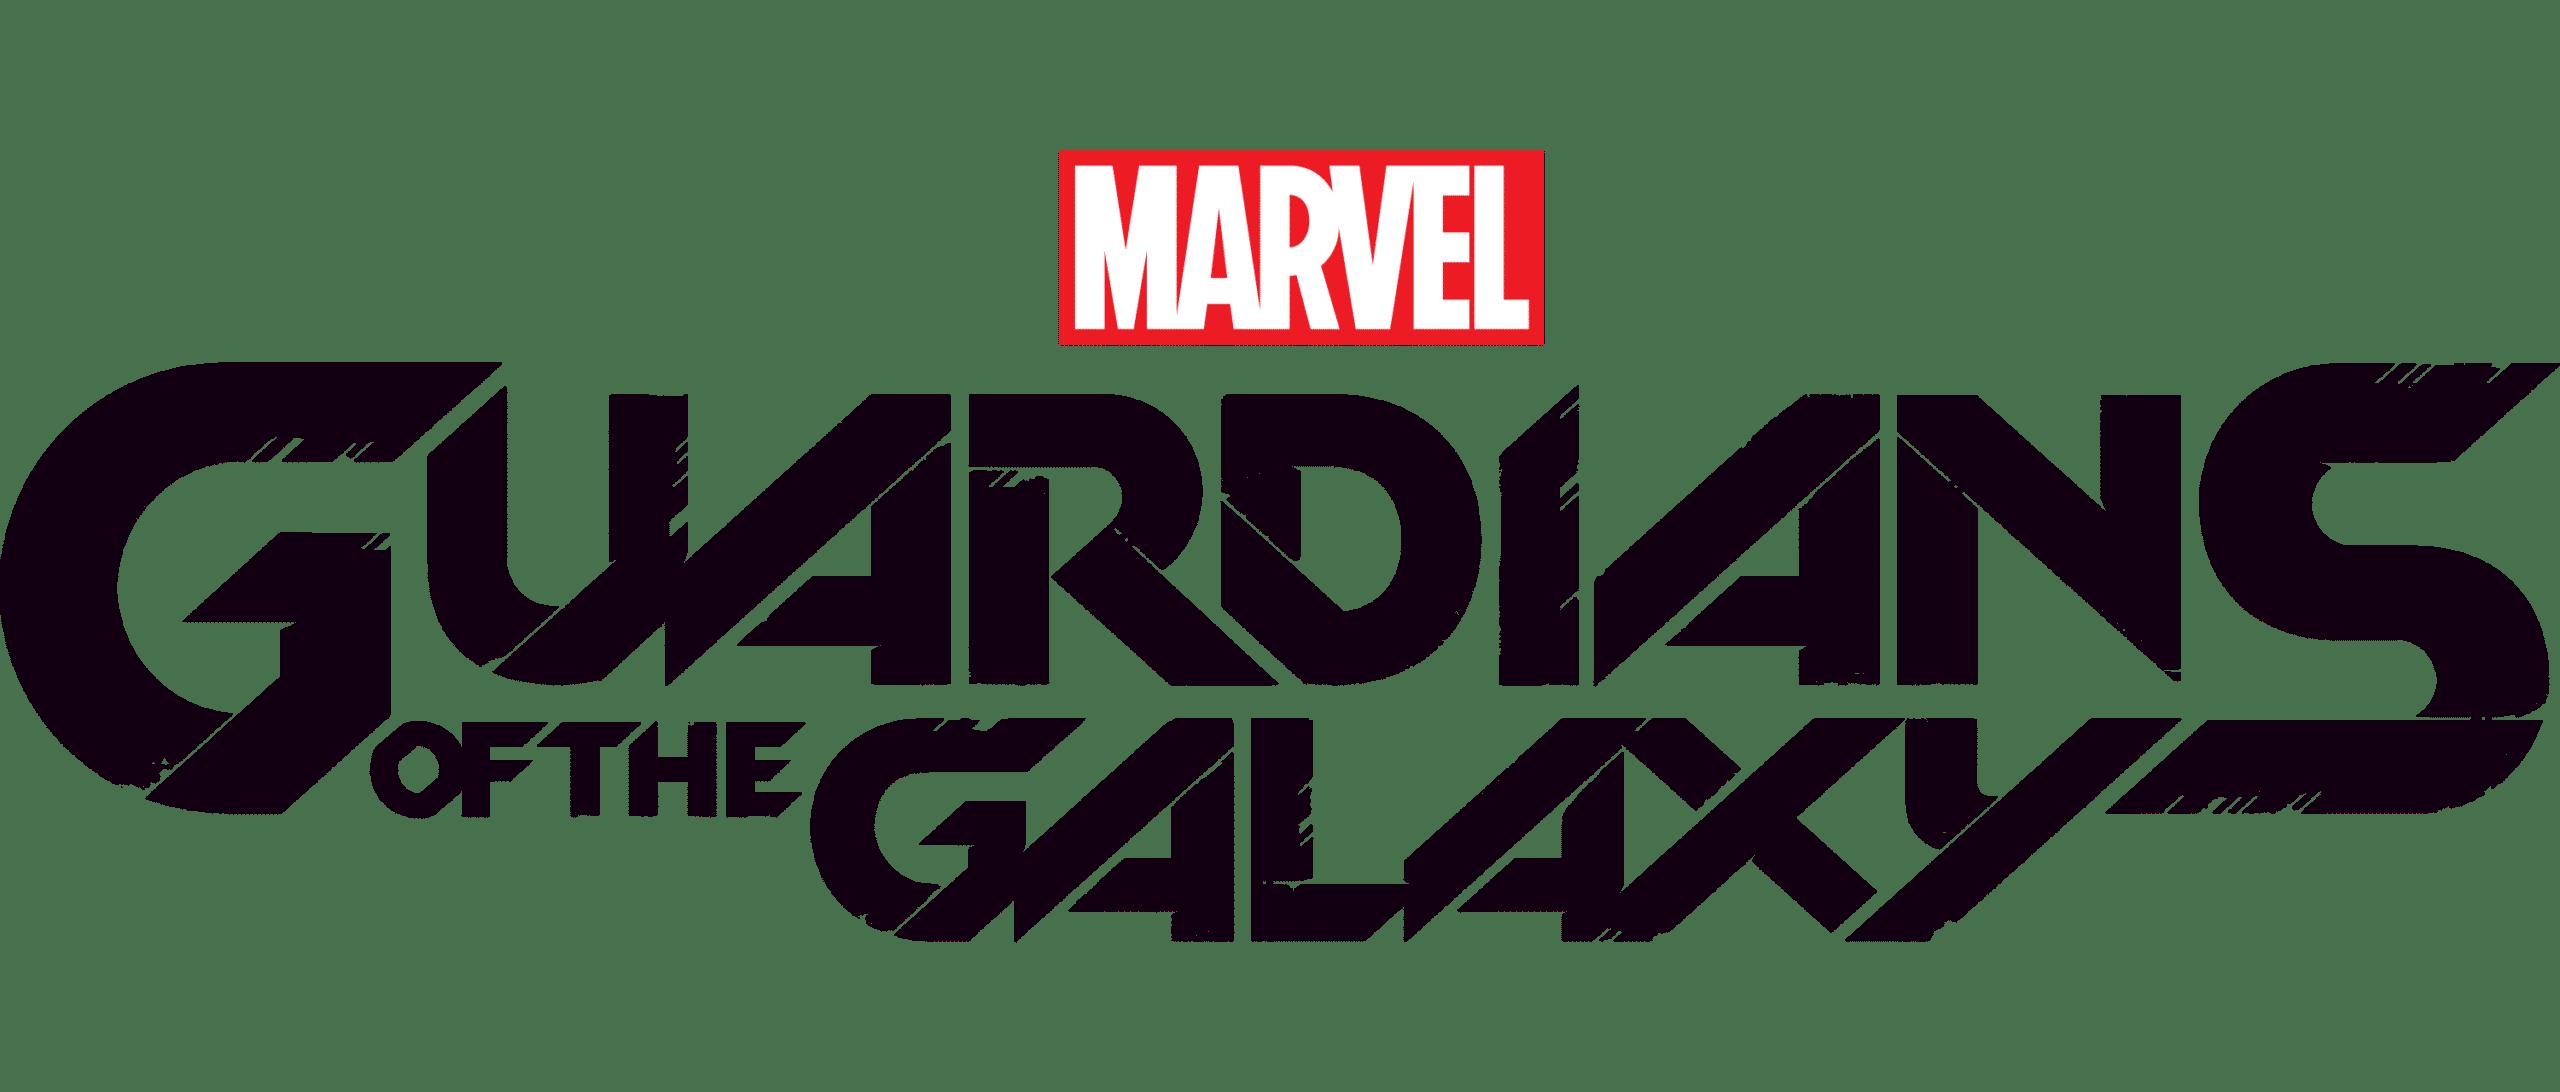 Guardians of the Galaxy: trailer e news sul nuovo gioco thumbnail